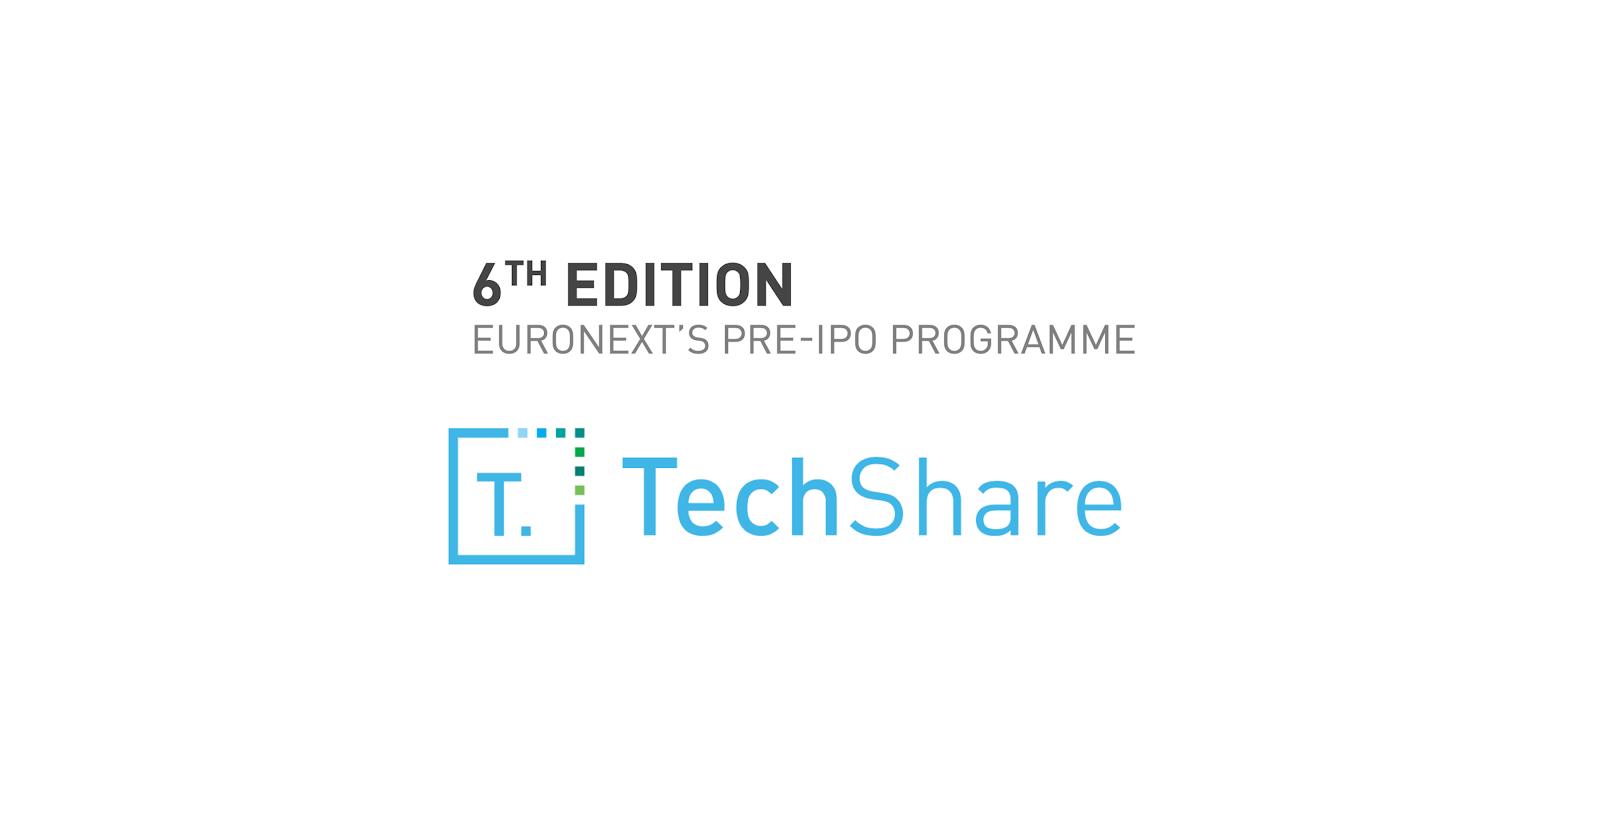 TechShare: Euronext Pre-IPO Programme 2021